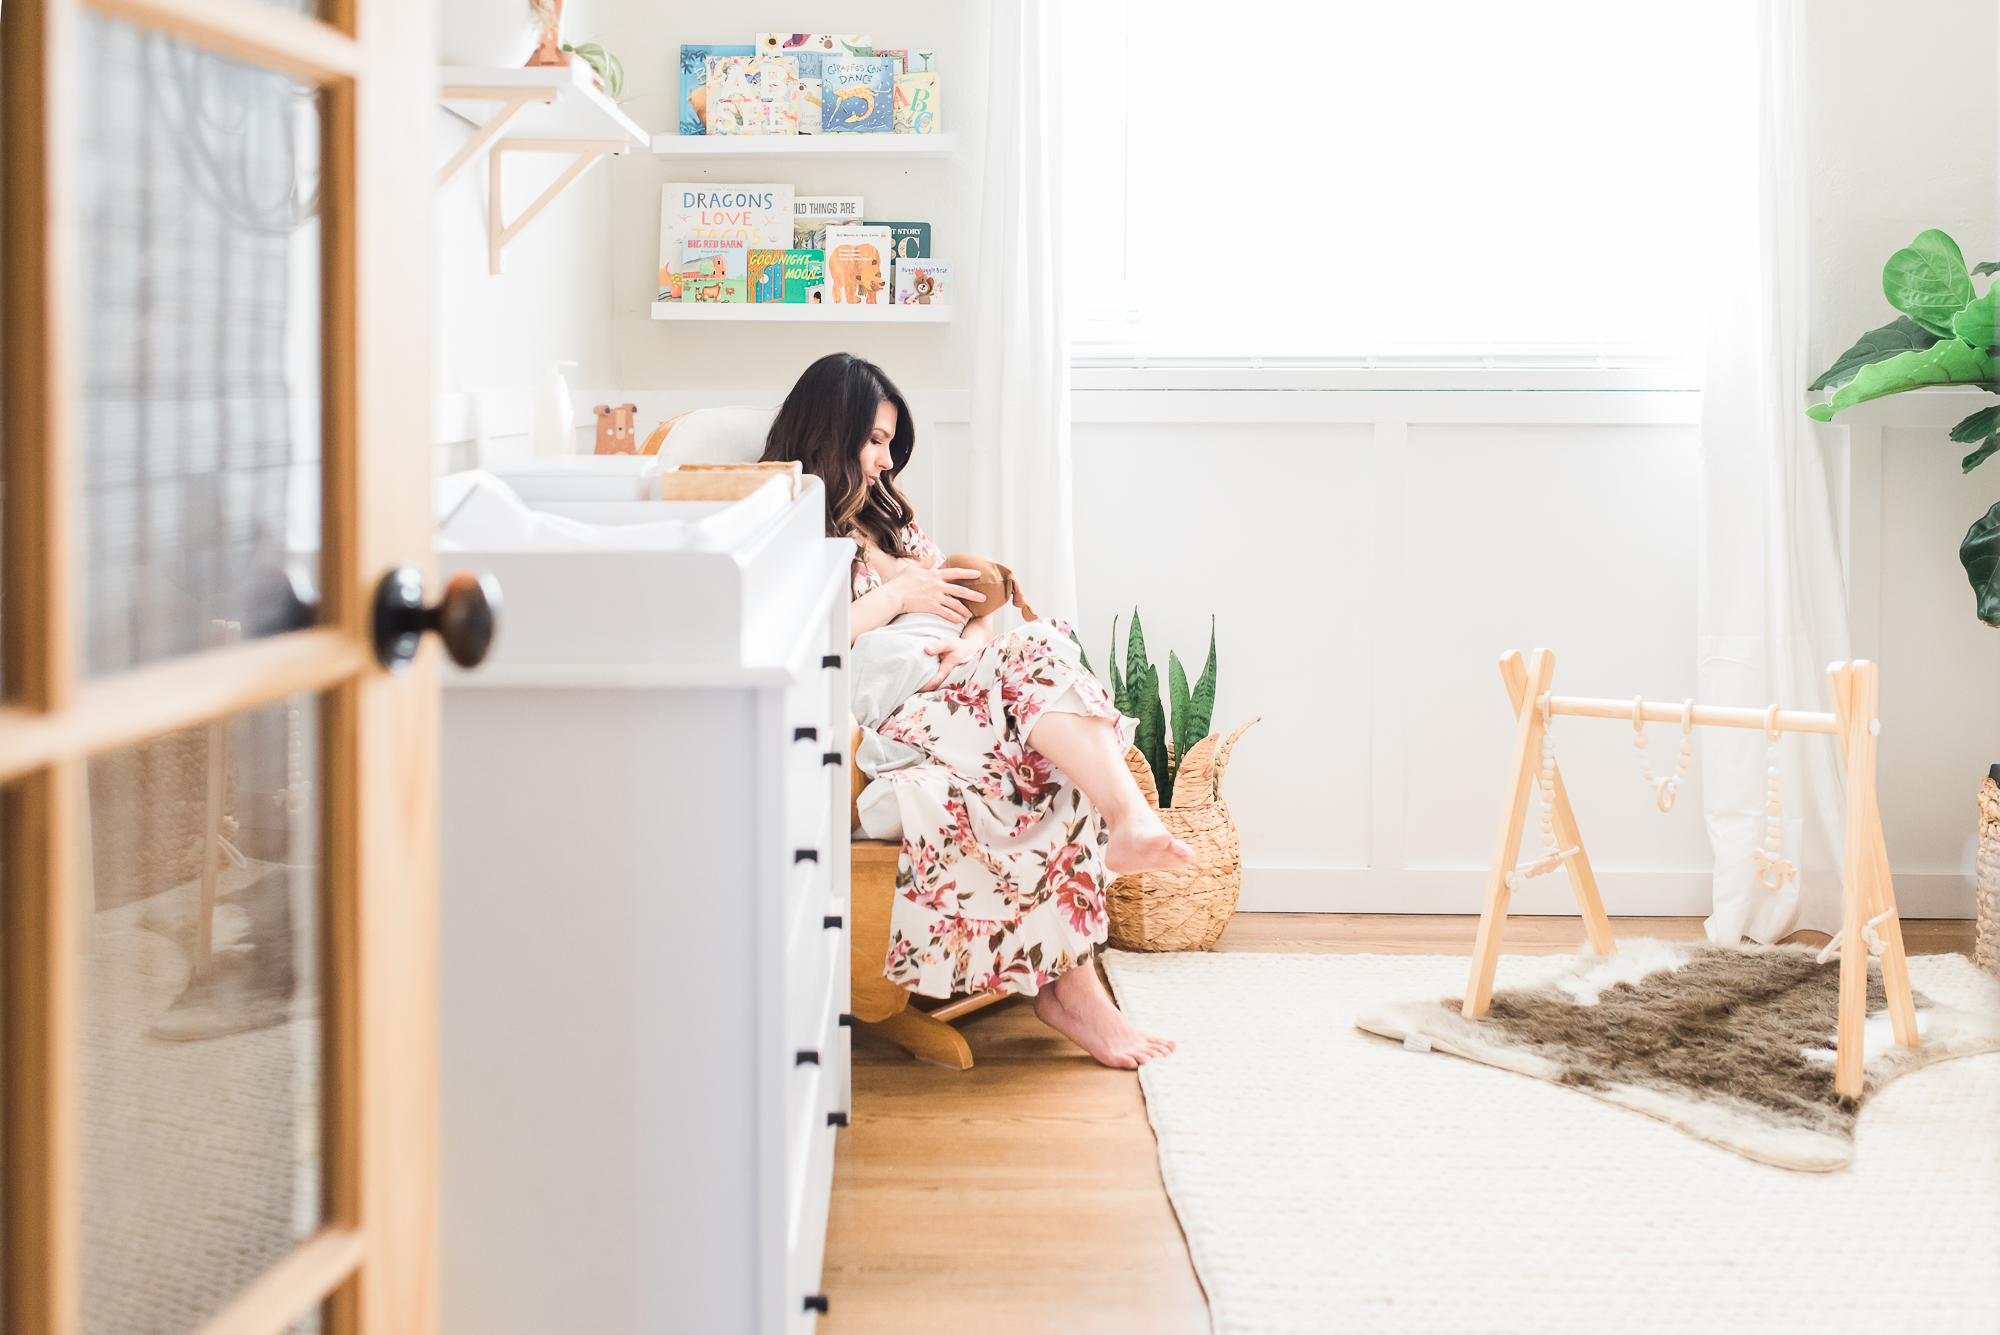 southwest theme nursery, nursery decor, mom and baby in nursery, newborn lifestyle photos